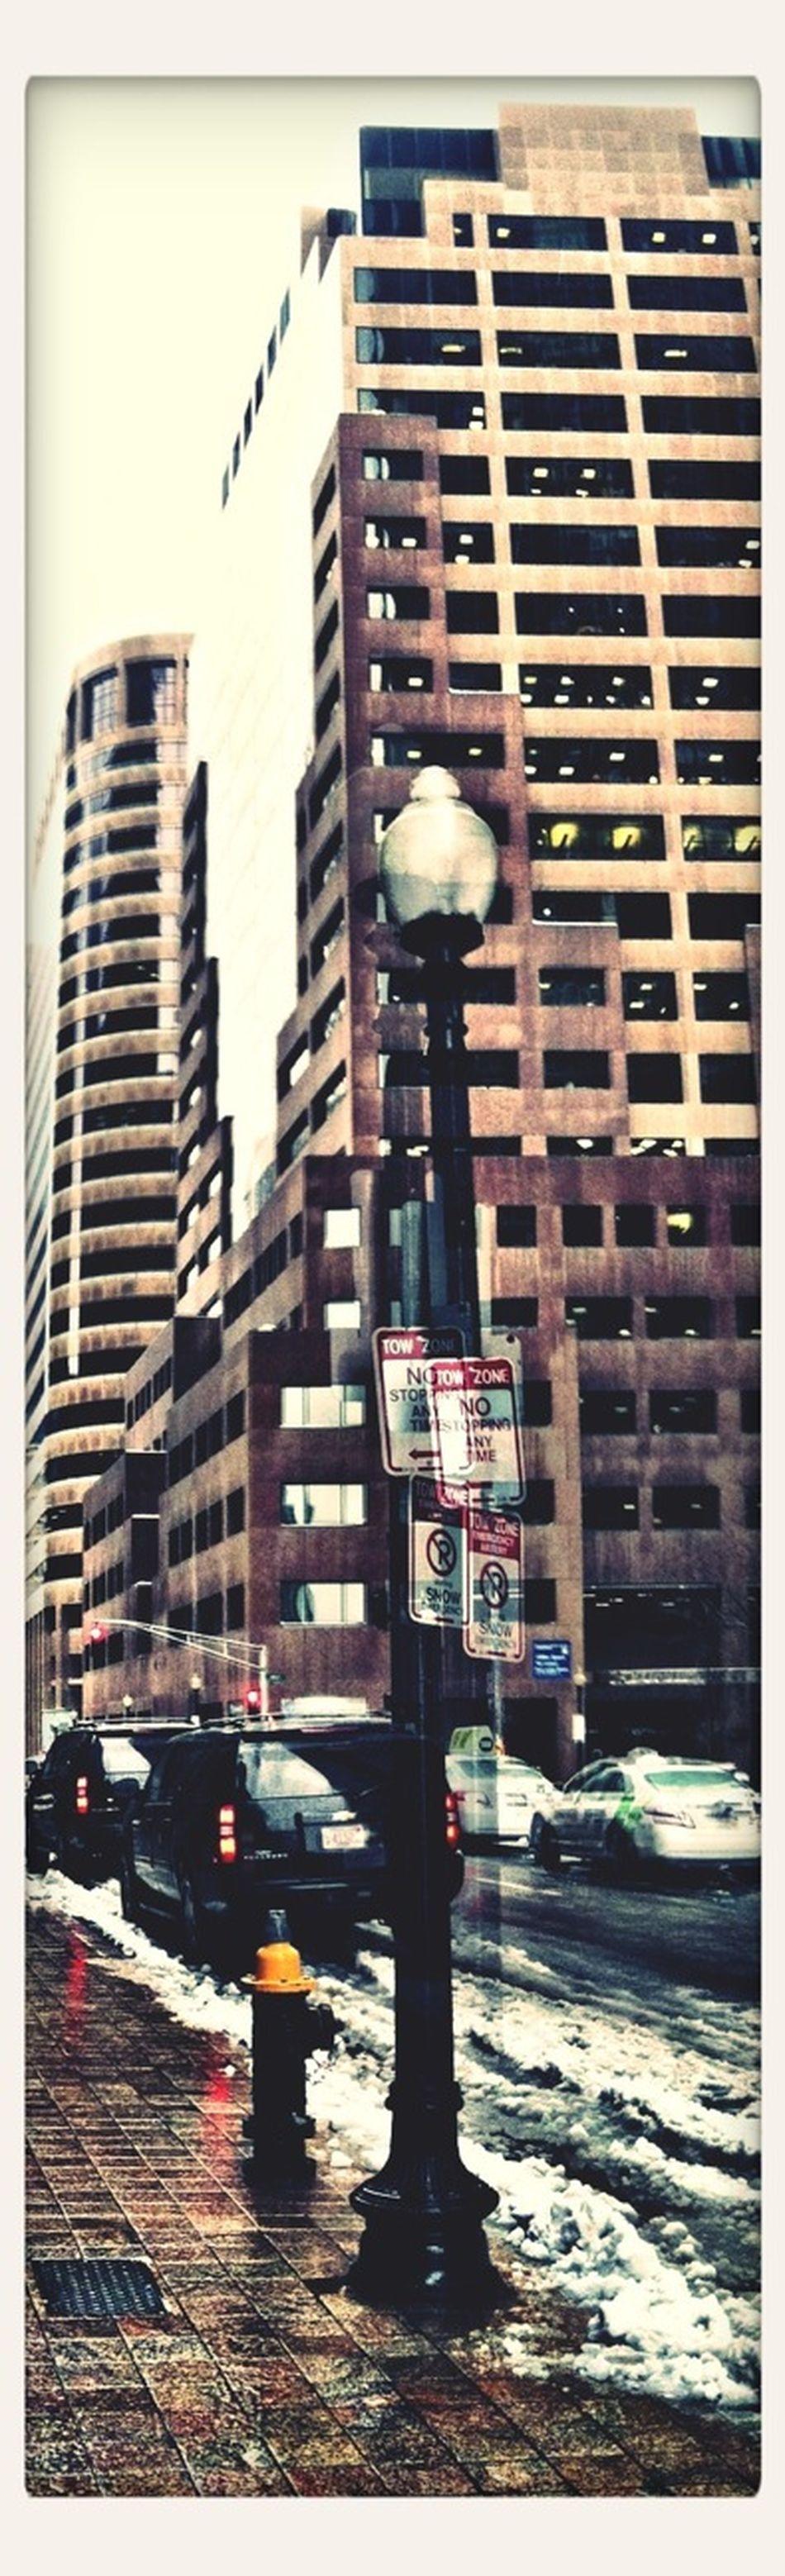 Architecture Streetphotography Panorama Urban Landscape